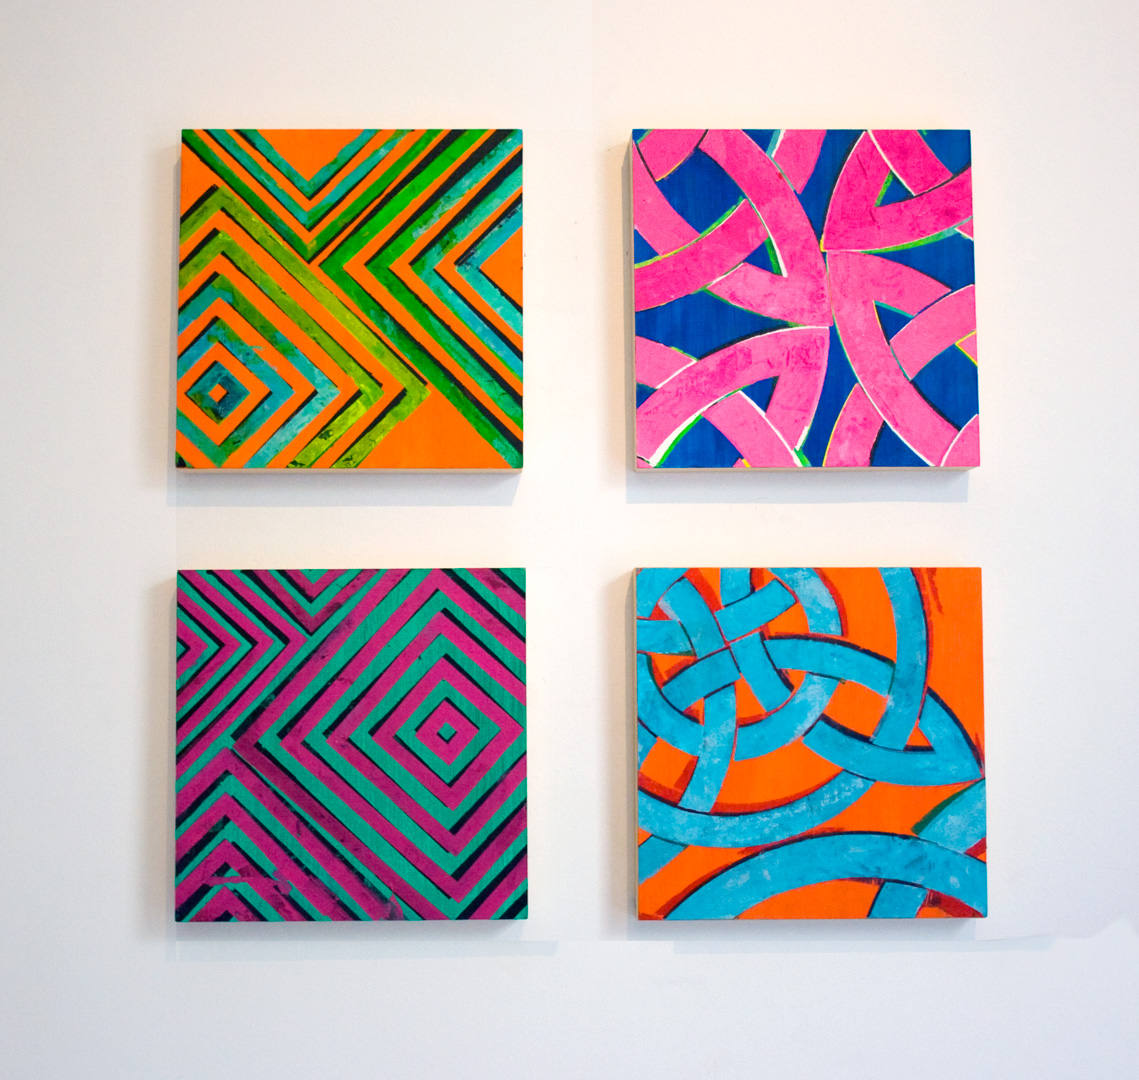 7 Types Of Terrain  |  Galerie du Jardin des Biehn, Morocco  |  2012